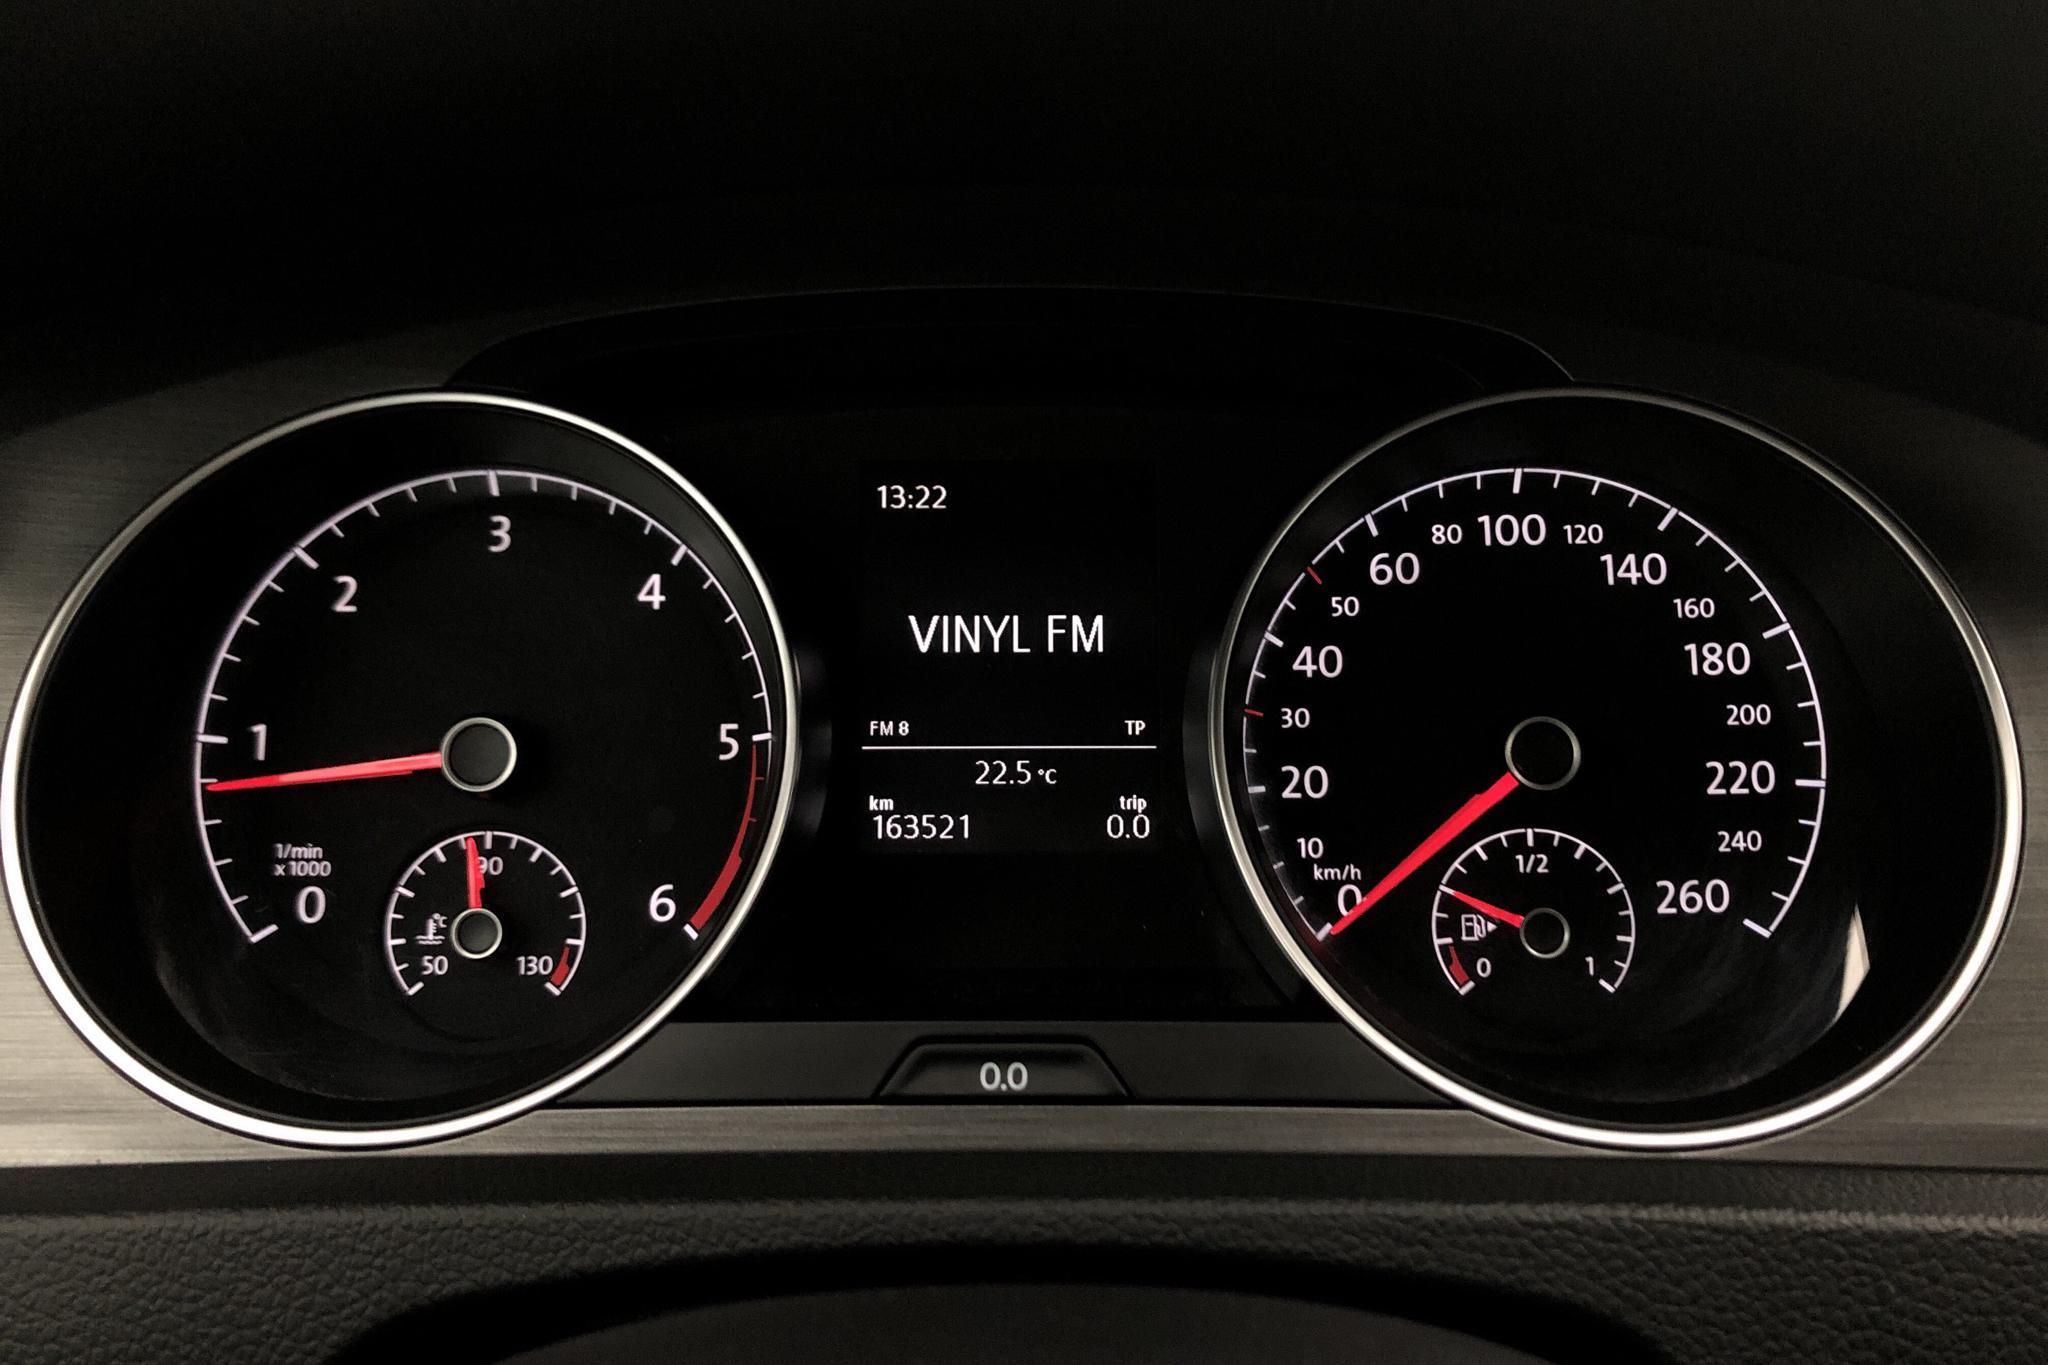 VW Golf VII 1.6 TDI BlueMotion Technology 5dr (105hk) - 163 510 km - Manual - red - 2013